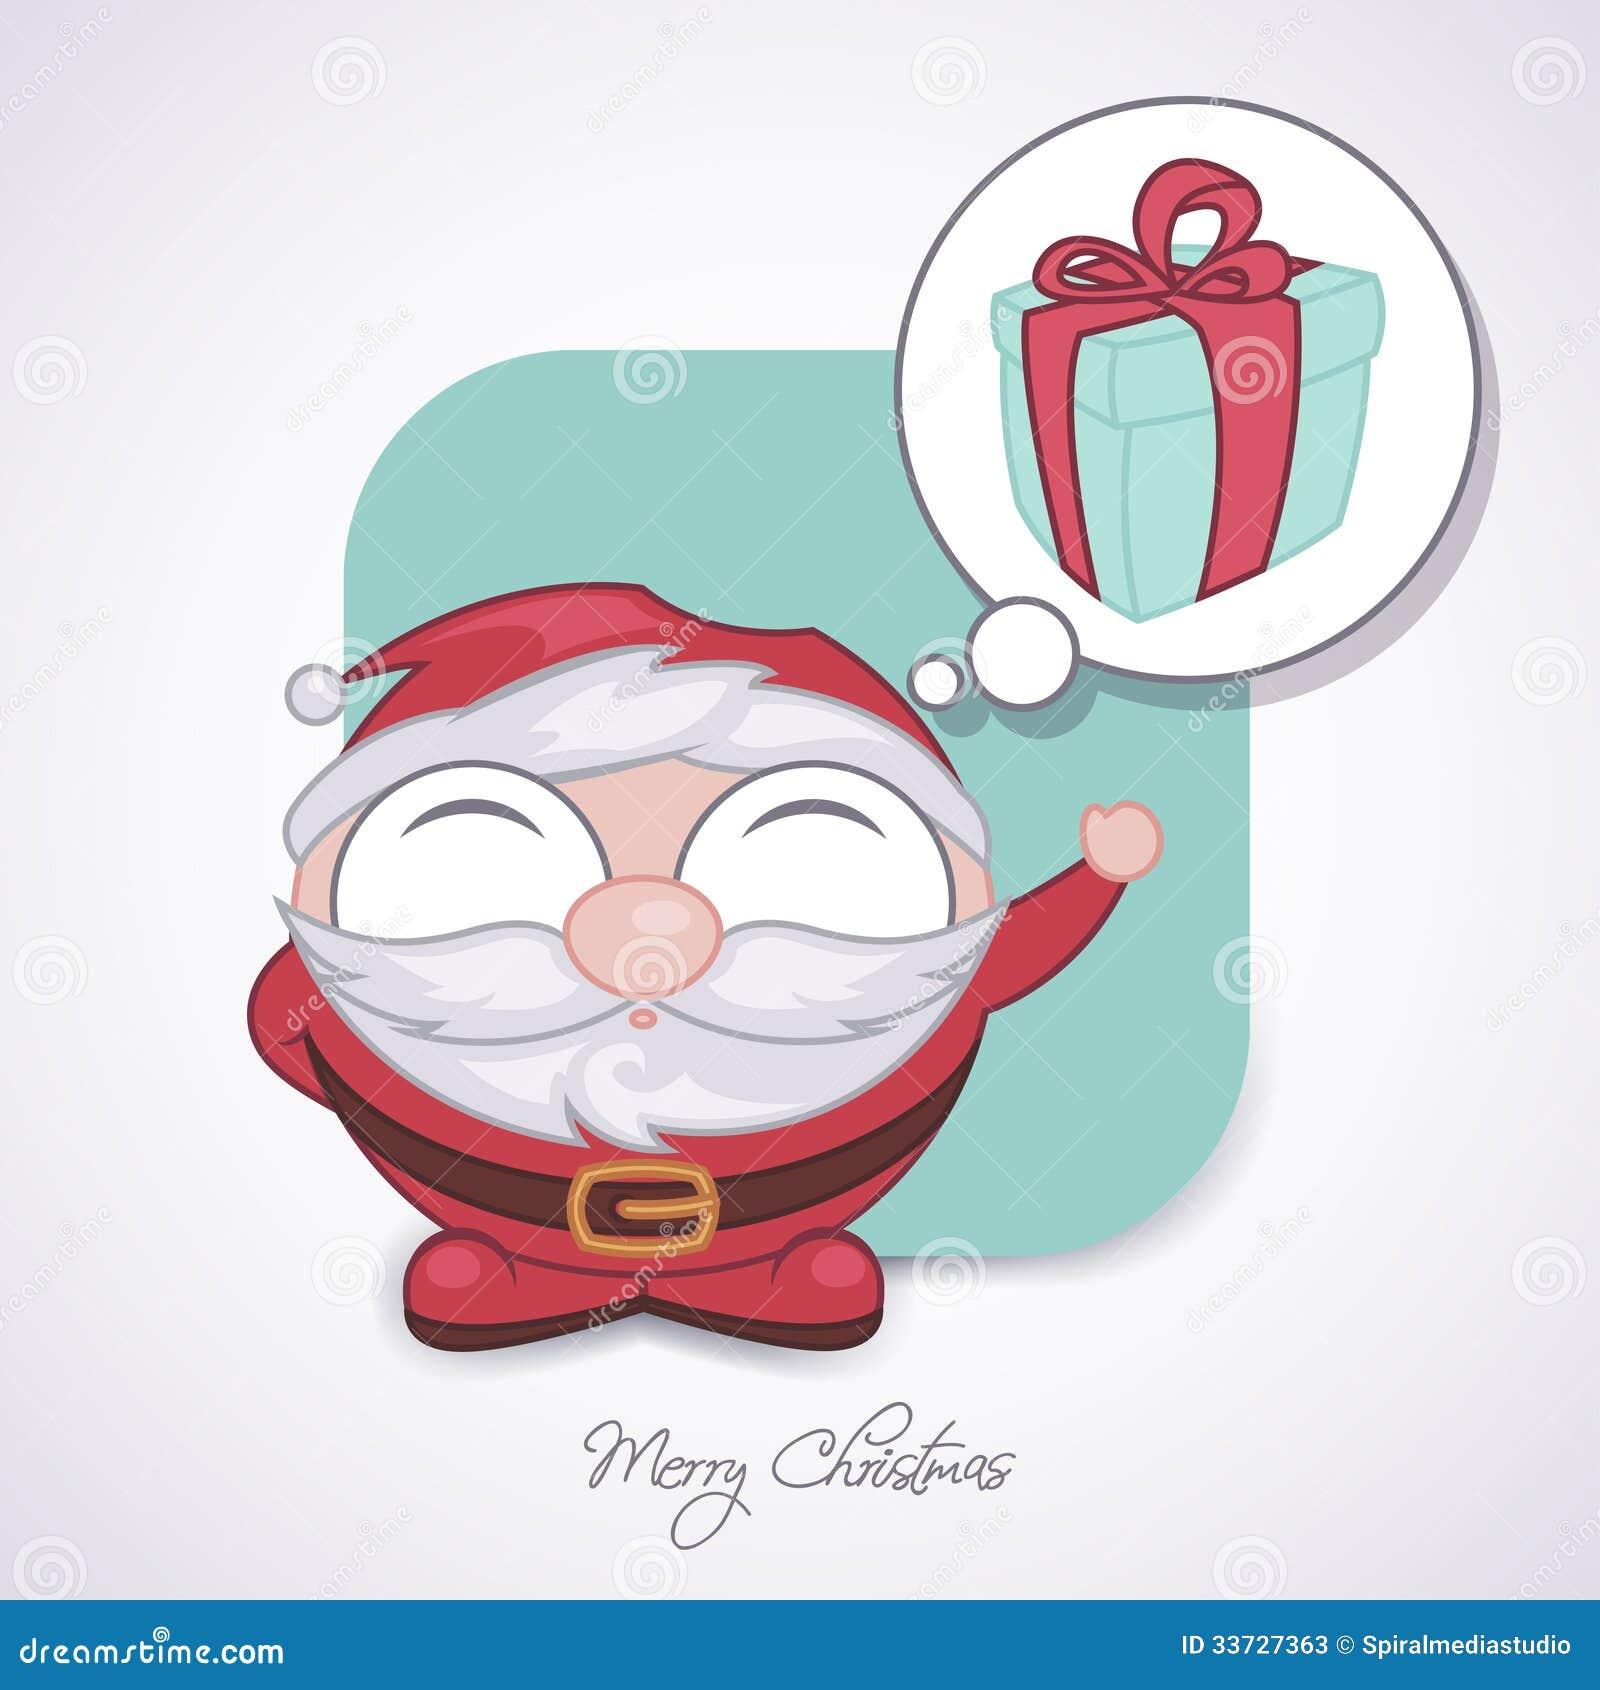 Санта Клаус tinking подарок